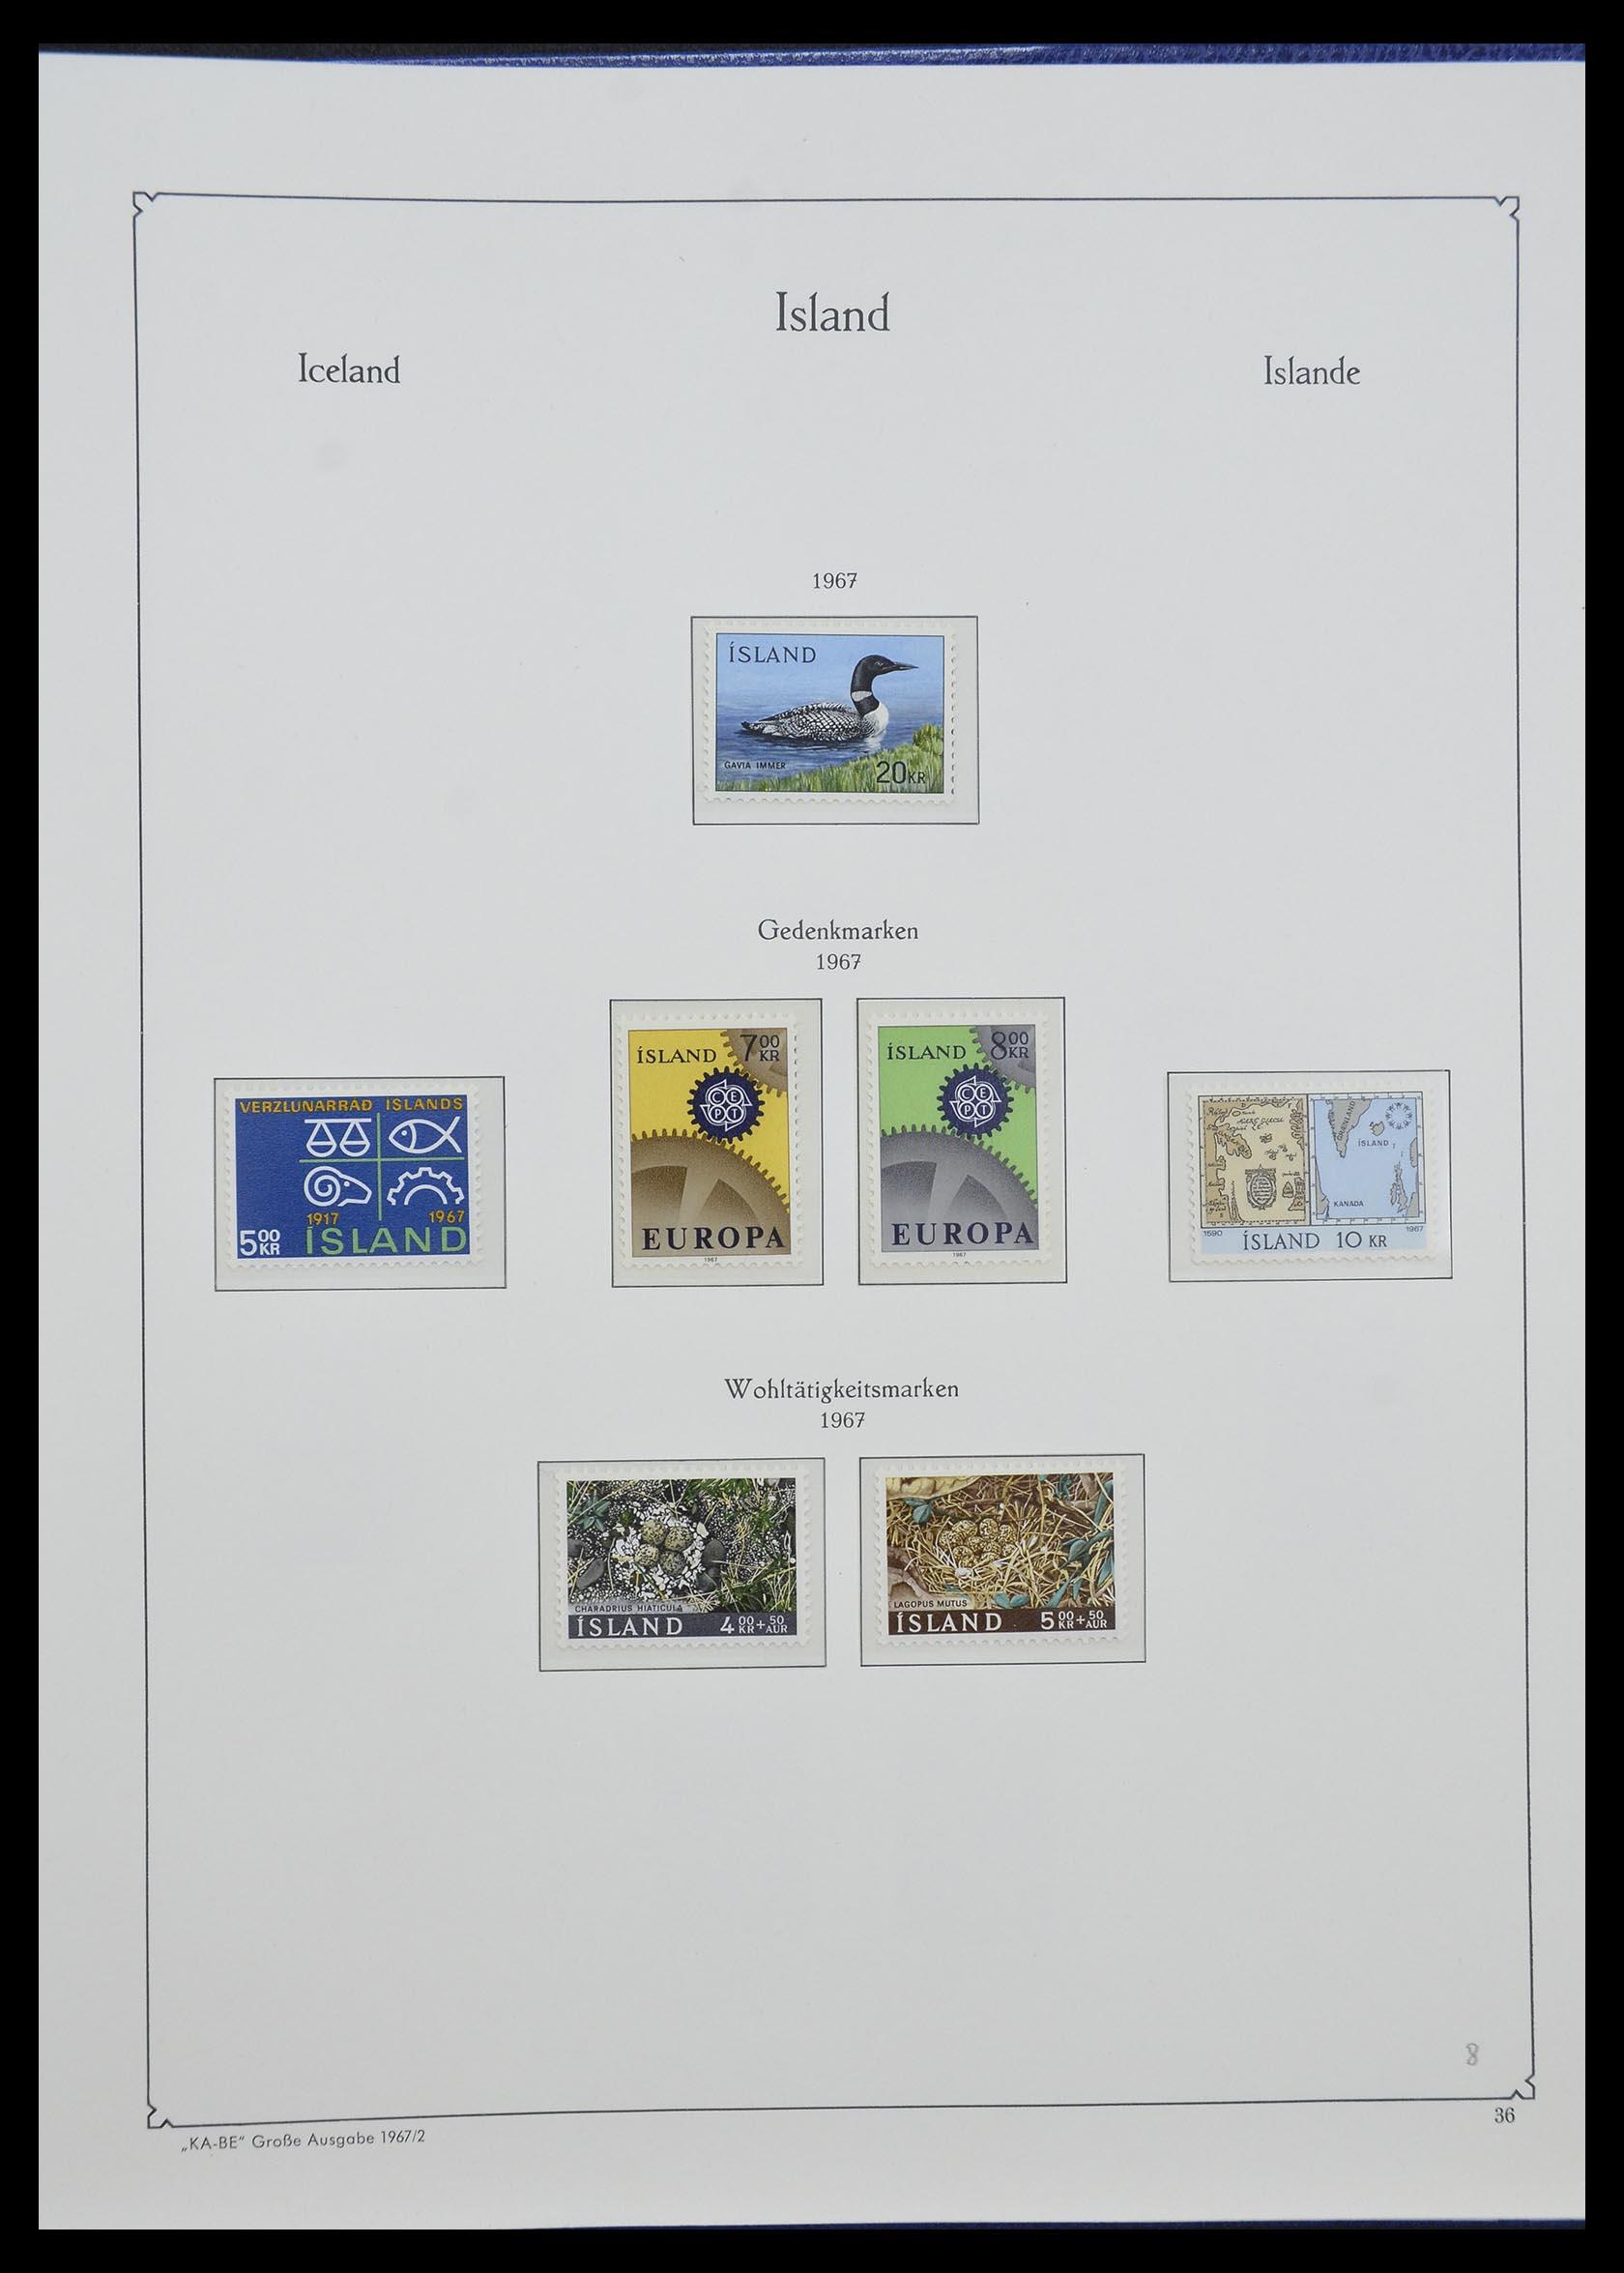 33185 019 - Postzegelverzameling 33184 Finland 1856-1990.